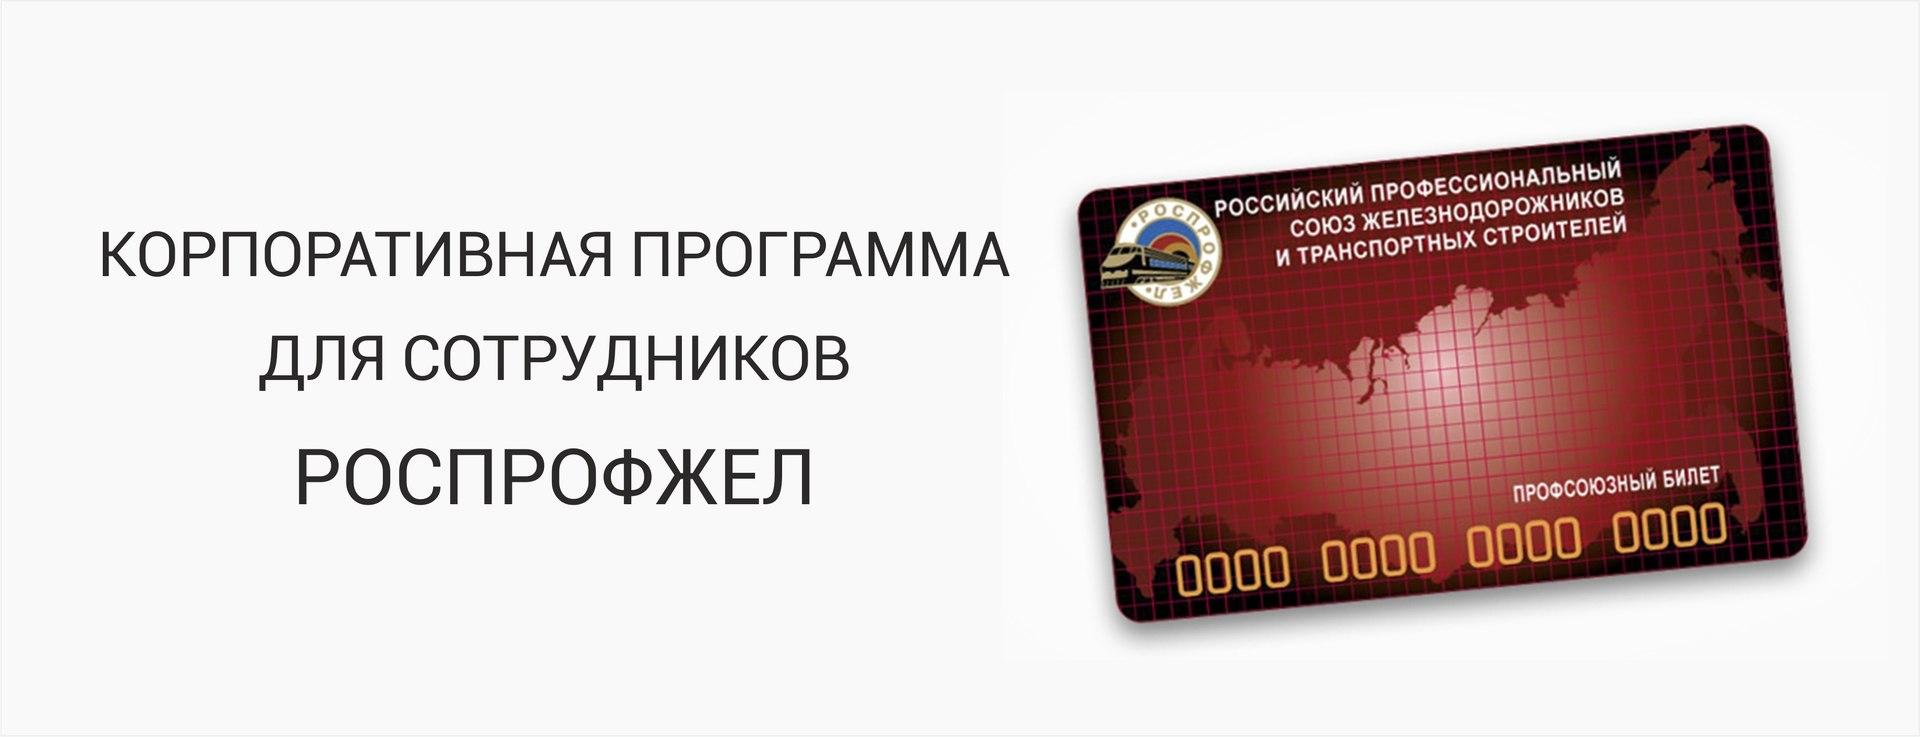 https://www.almazcom.ru/pub/img/QA/loyaltyprogram/rzhd1.jpg